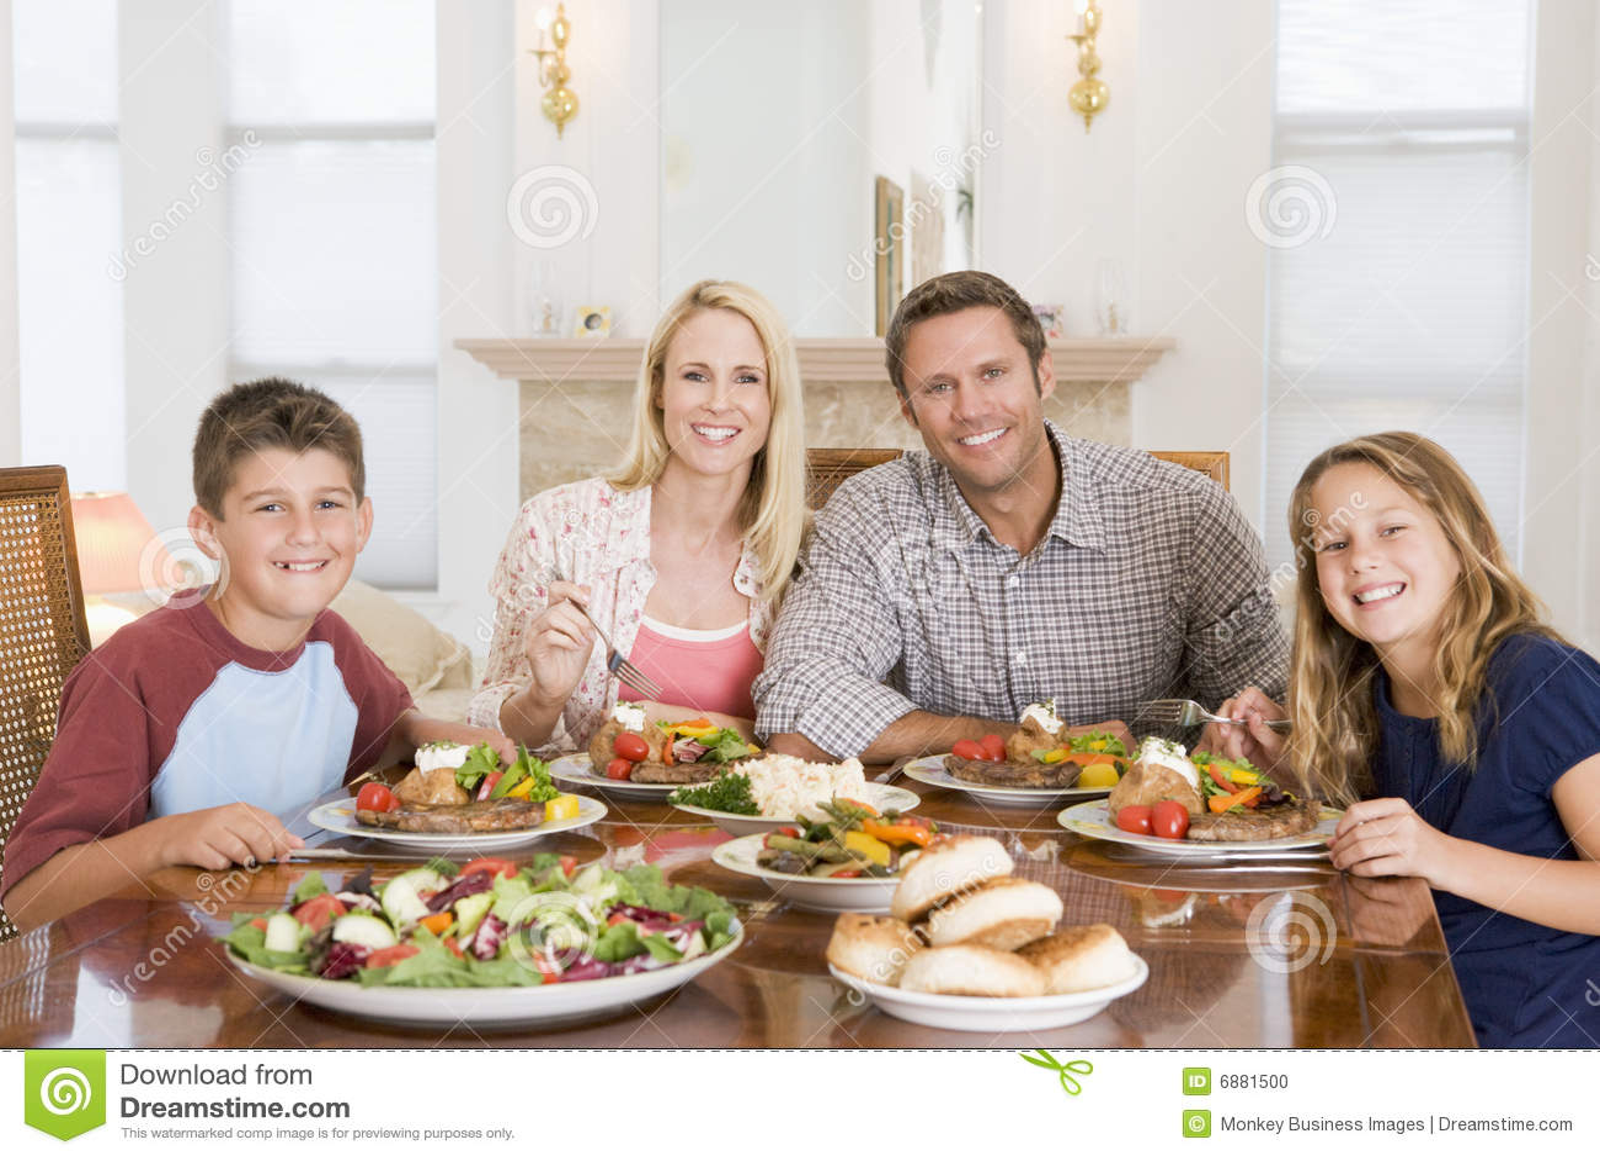 Фото семьи на кухне 3 фотография